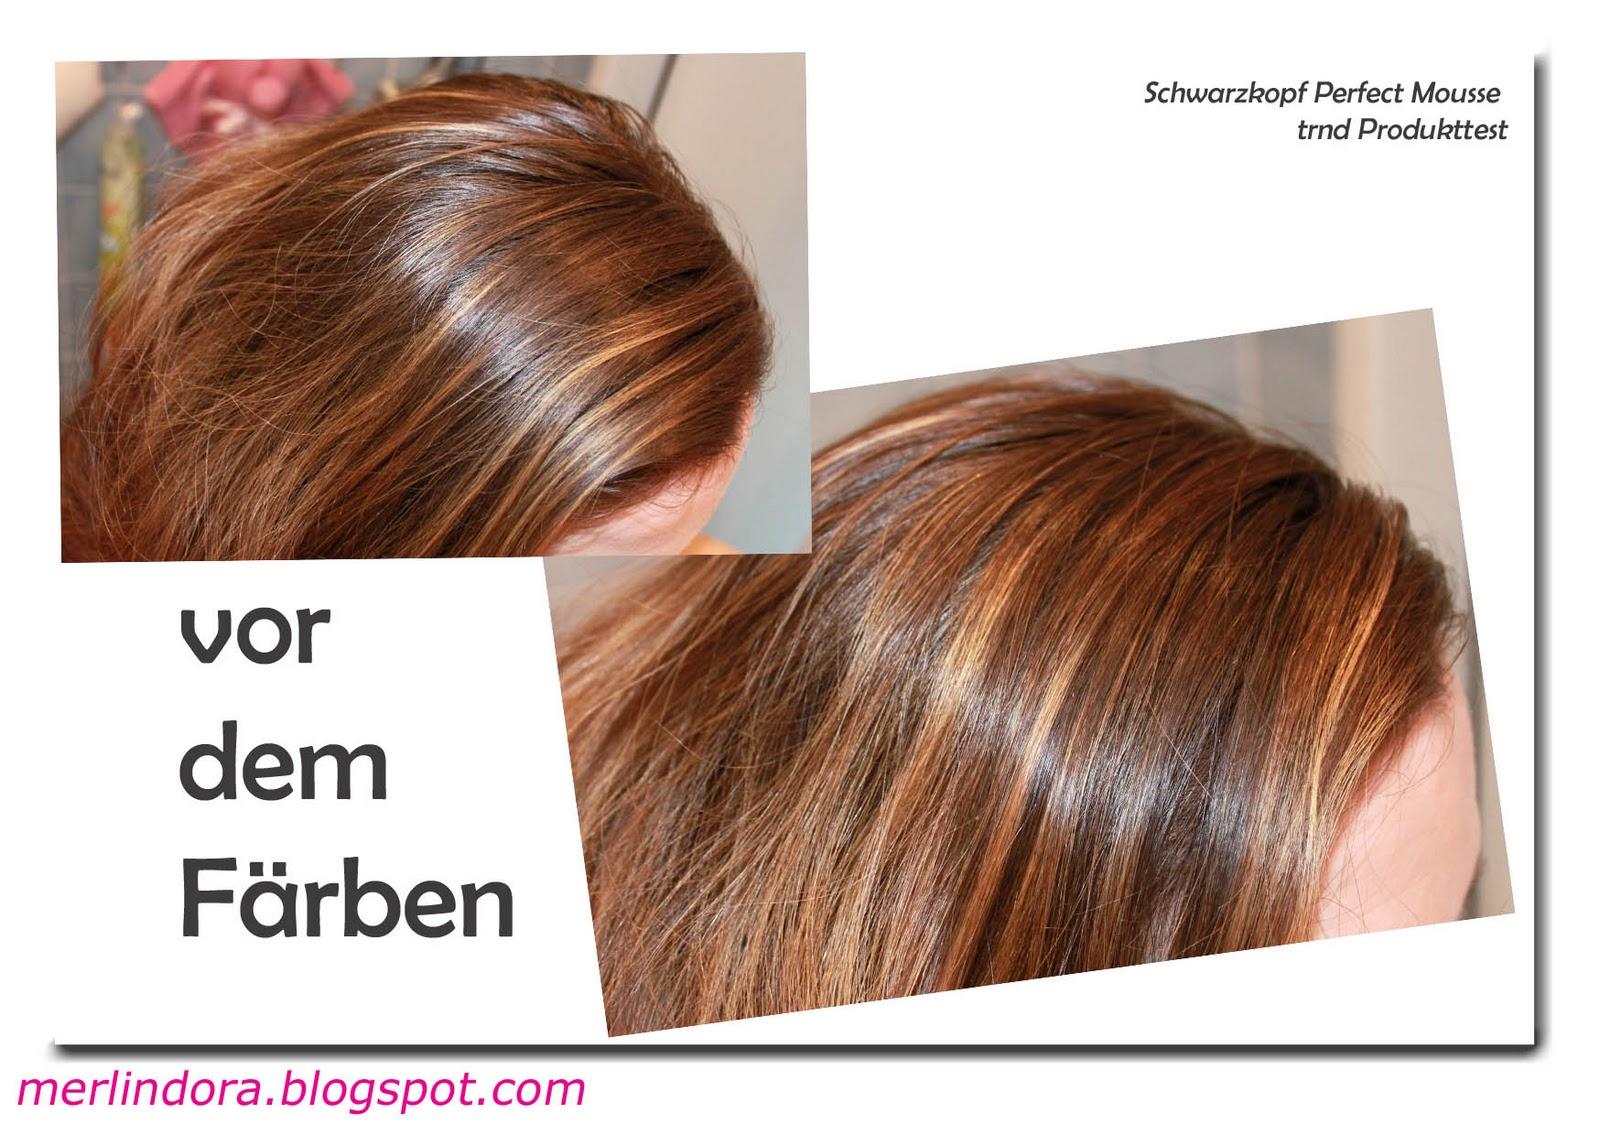 merlindoras blog trnd projekt schwarzkopf perfect mousse